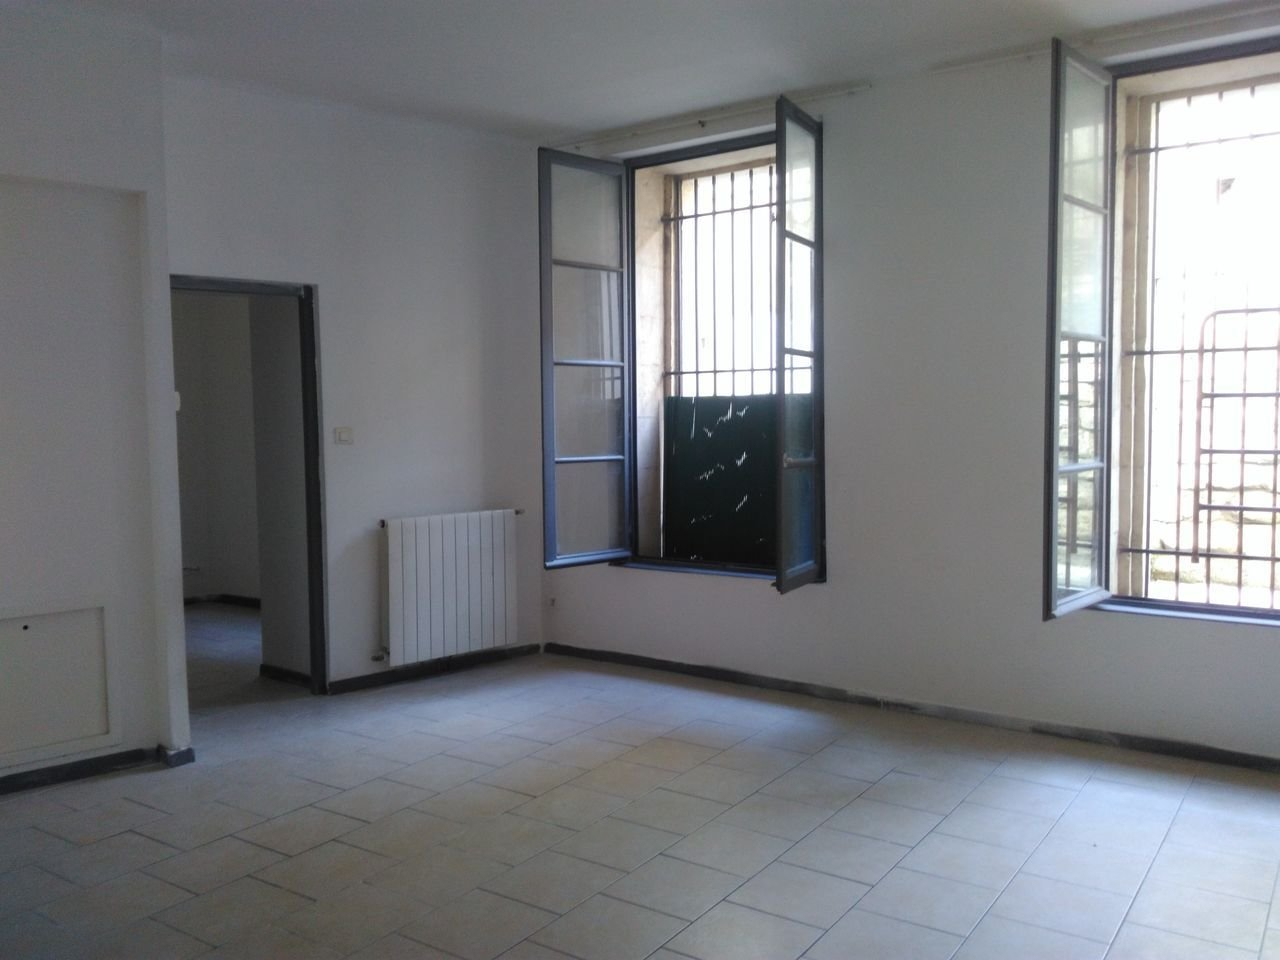 Vente Appartement BEAUCAIRE individuel, gaz chauffage